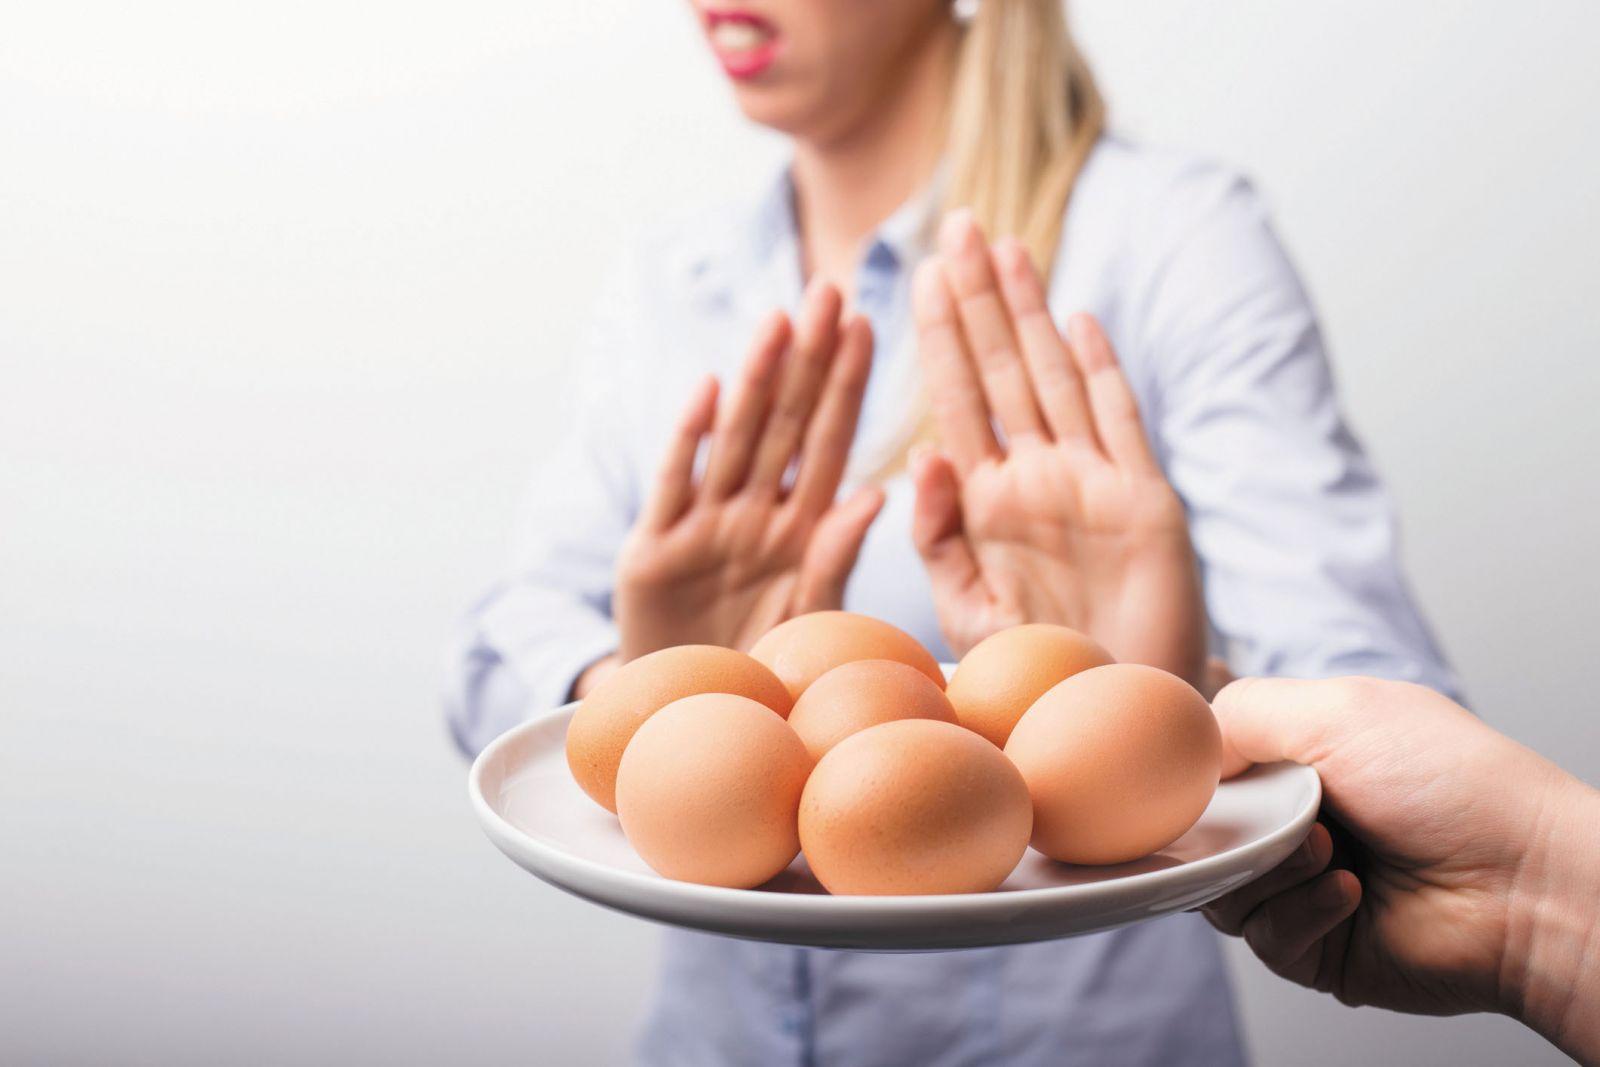 egg intolerance